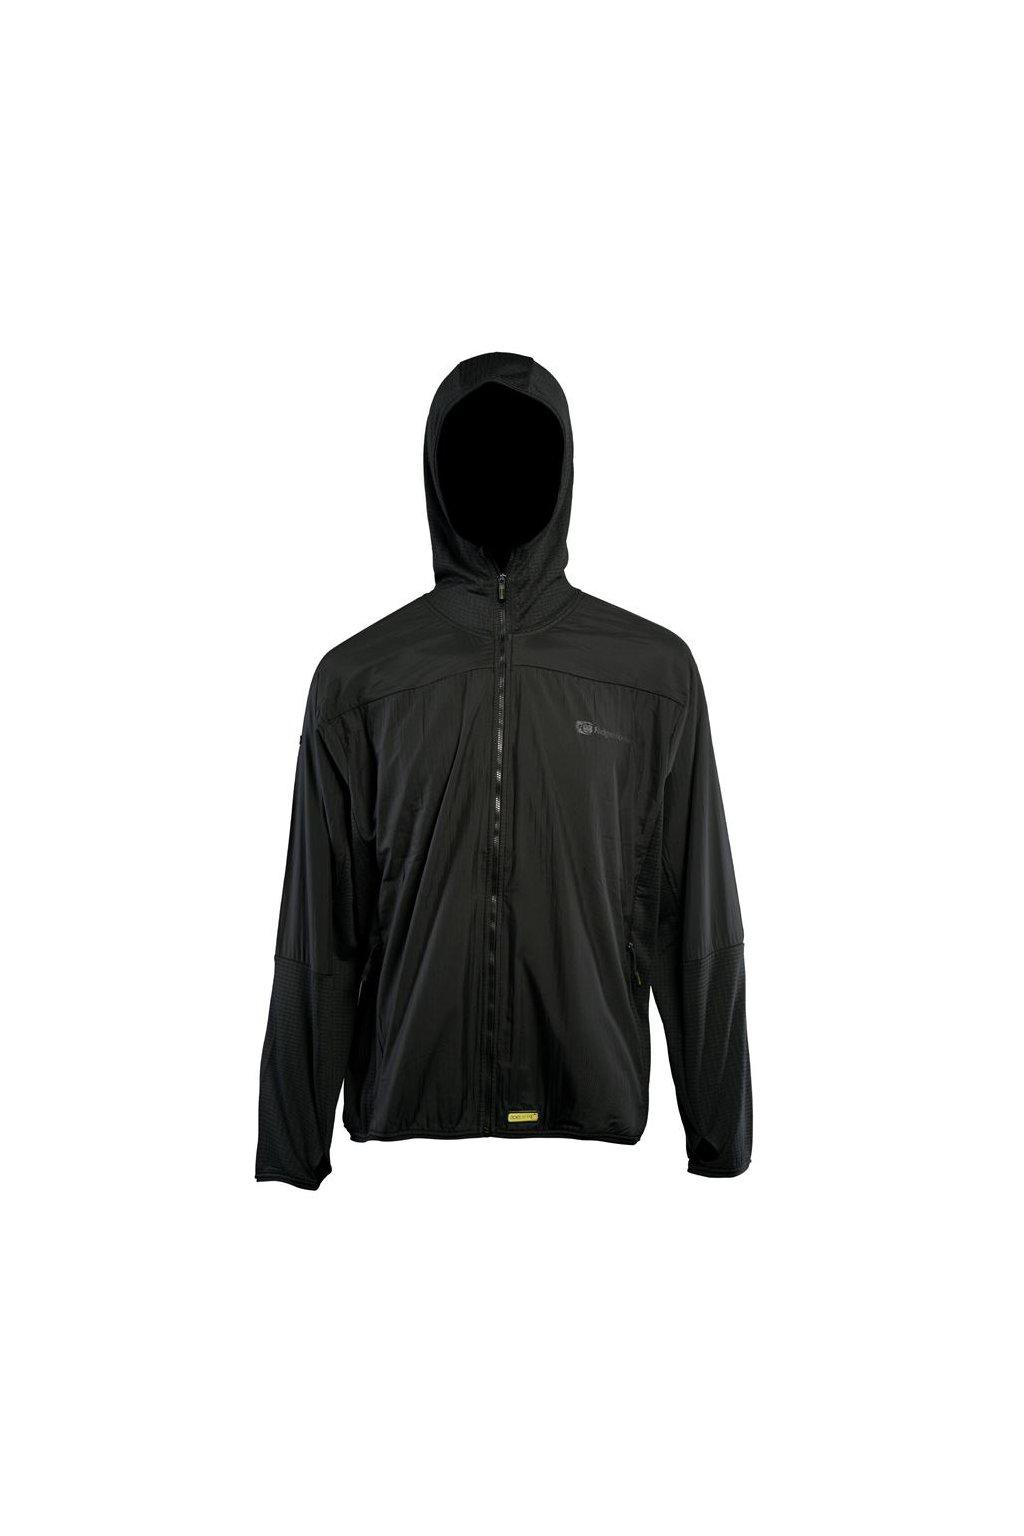 RidgeMonkey: Bunda APEarel Dropback Lightweight Zip Jacket Black Velikost L